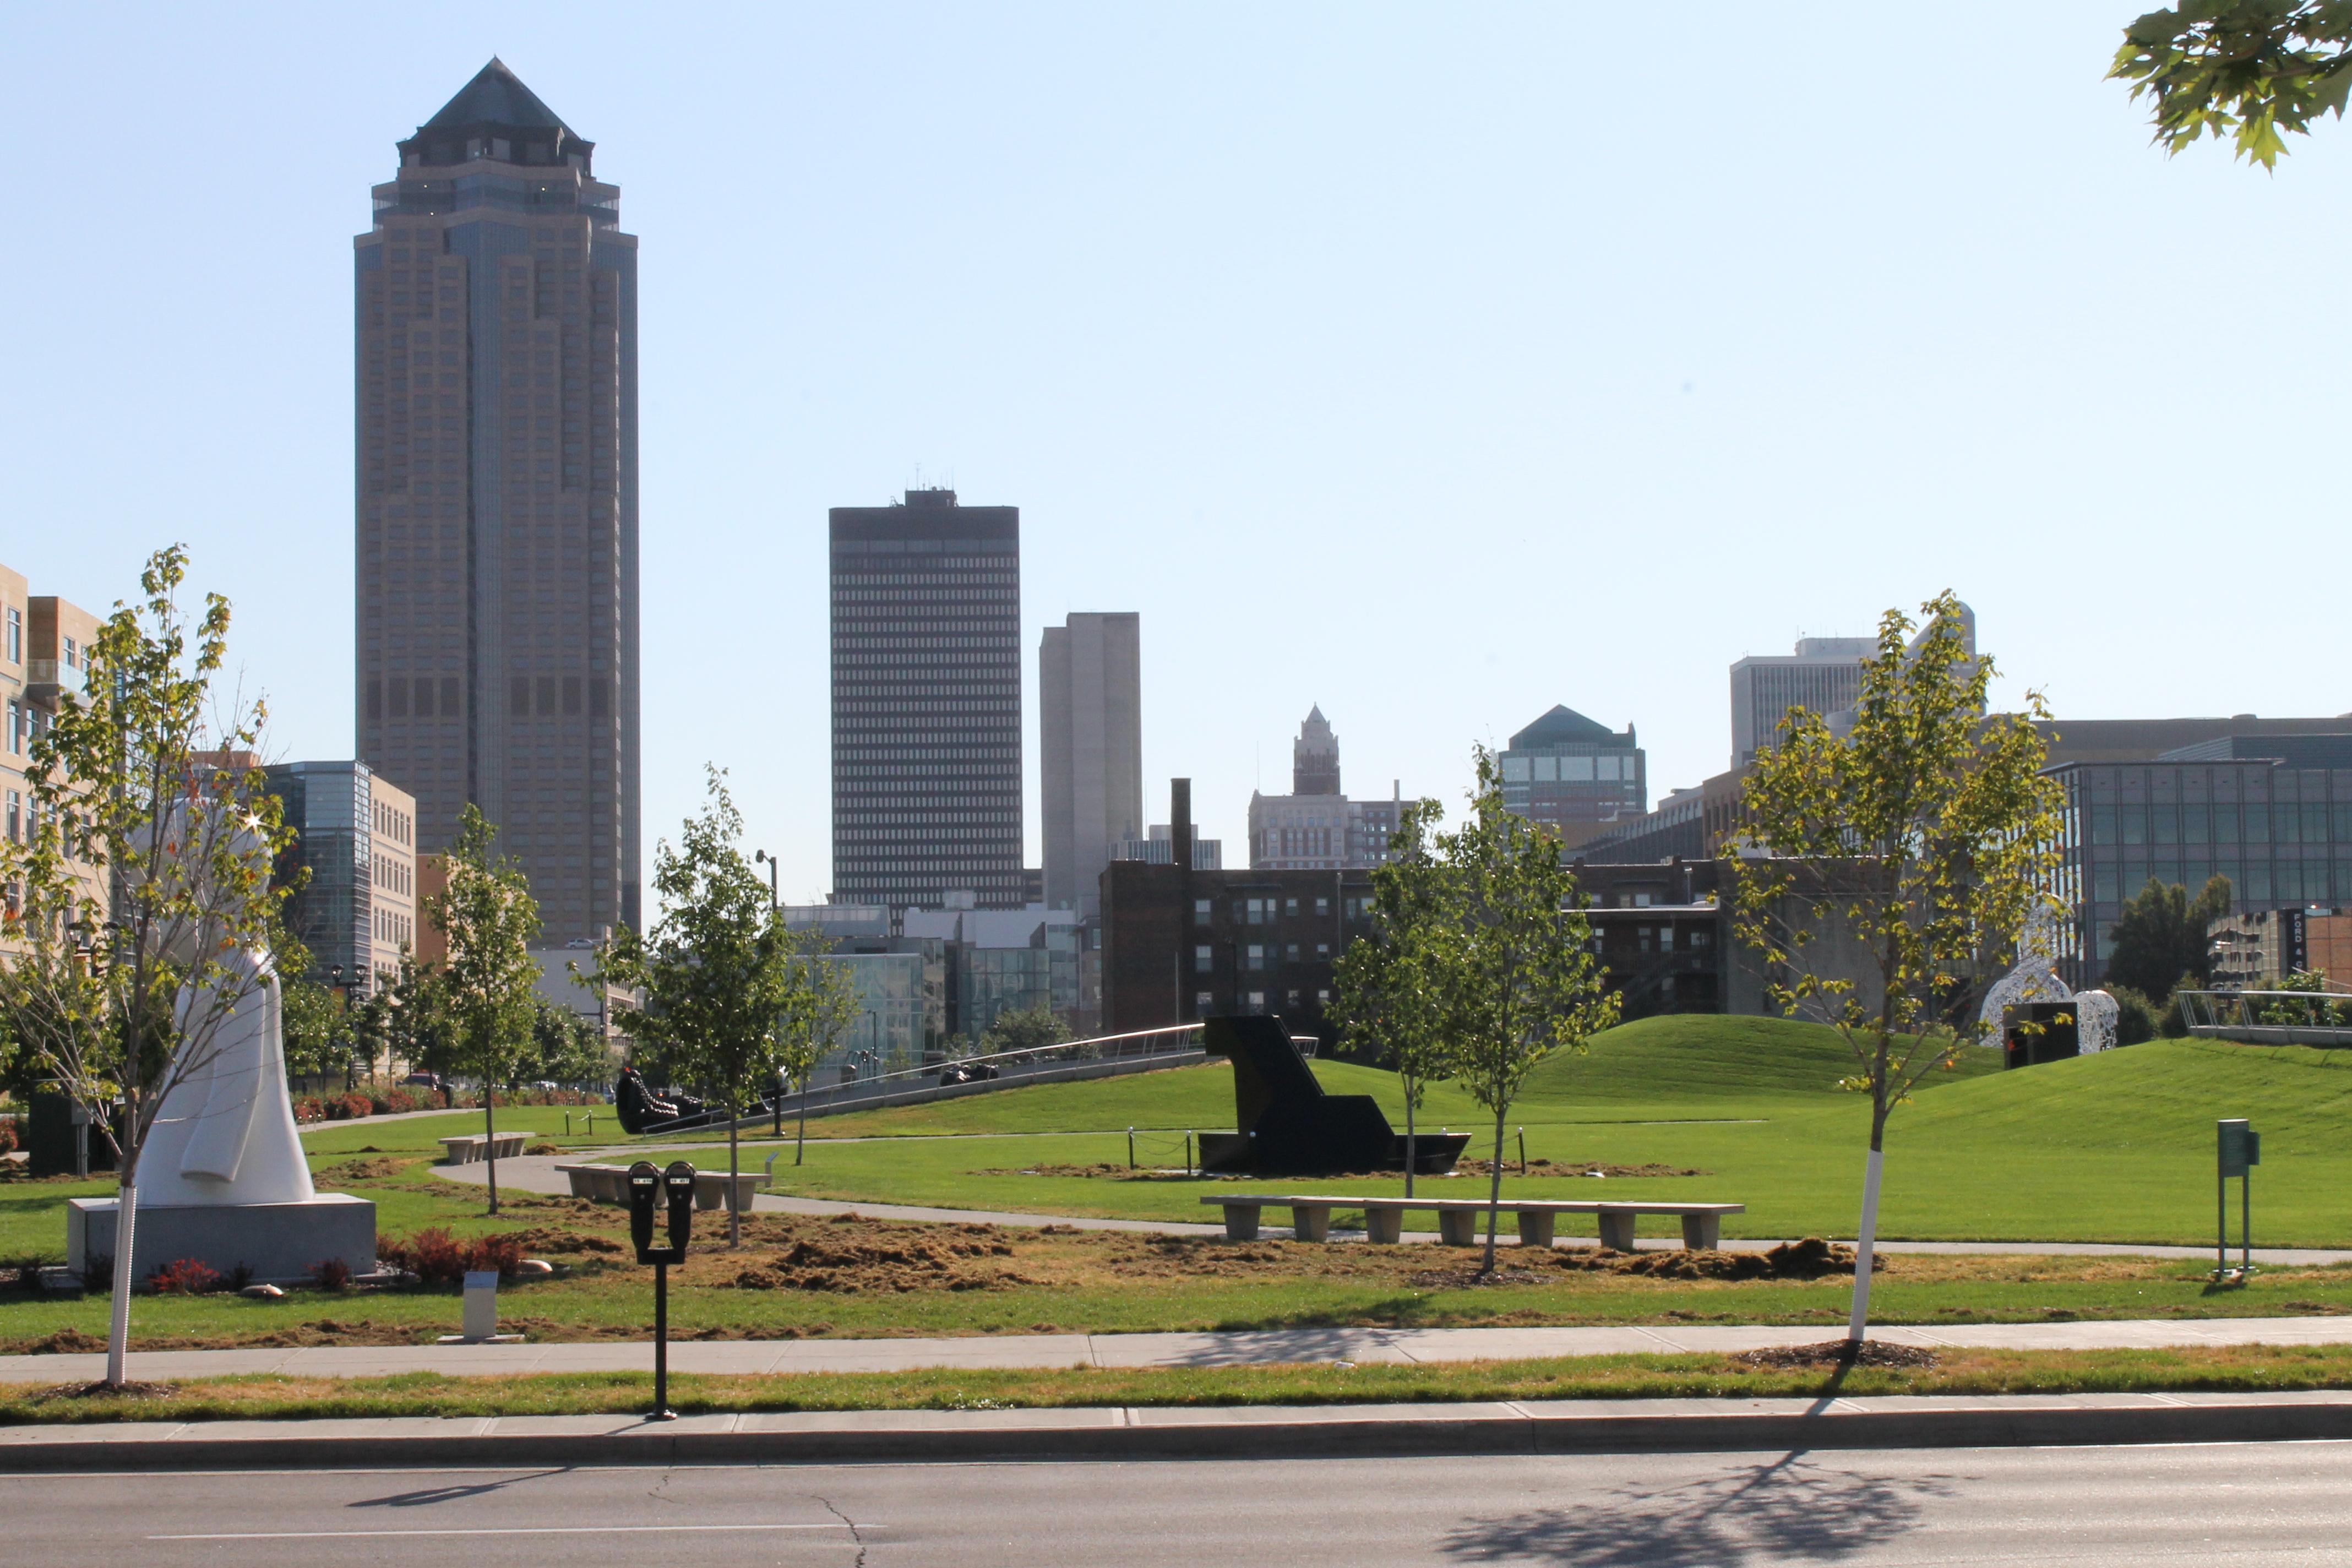 South Side Restaurants Des Moines